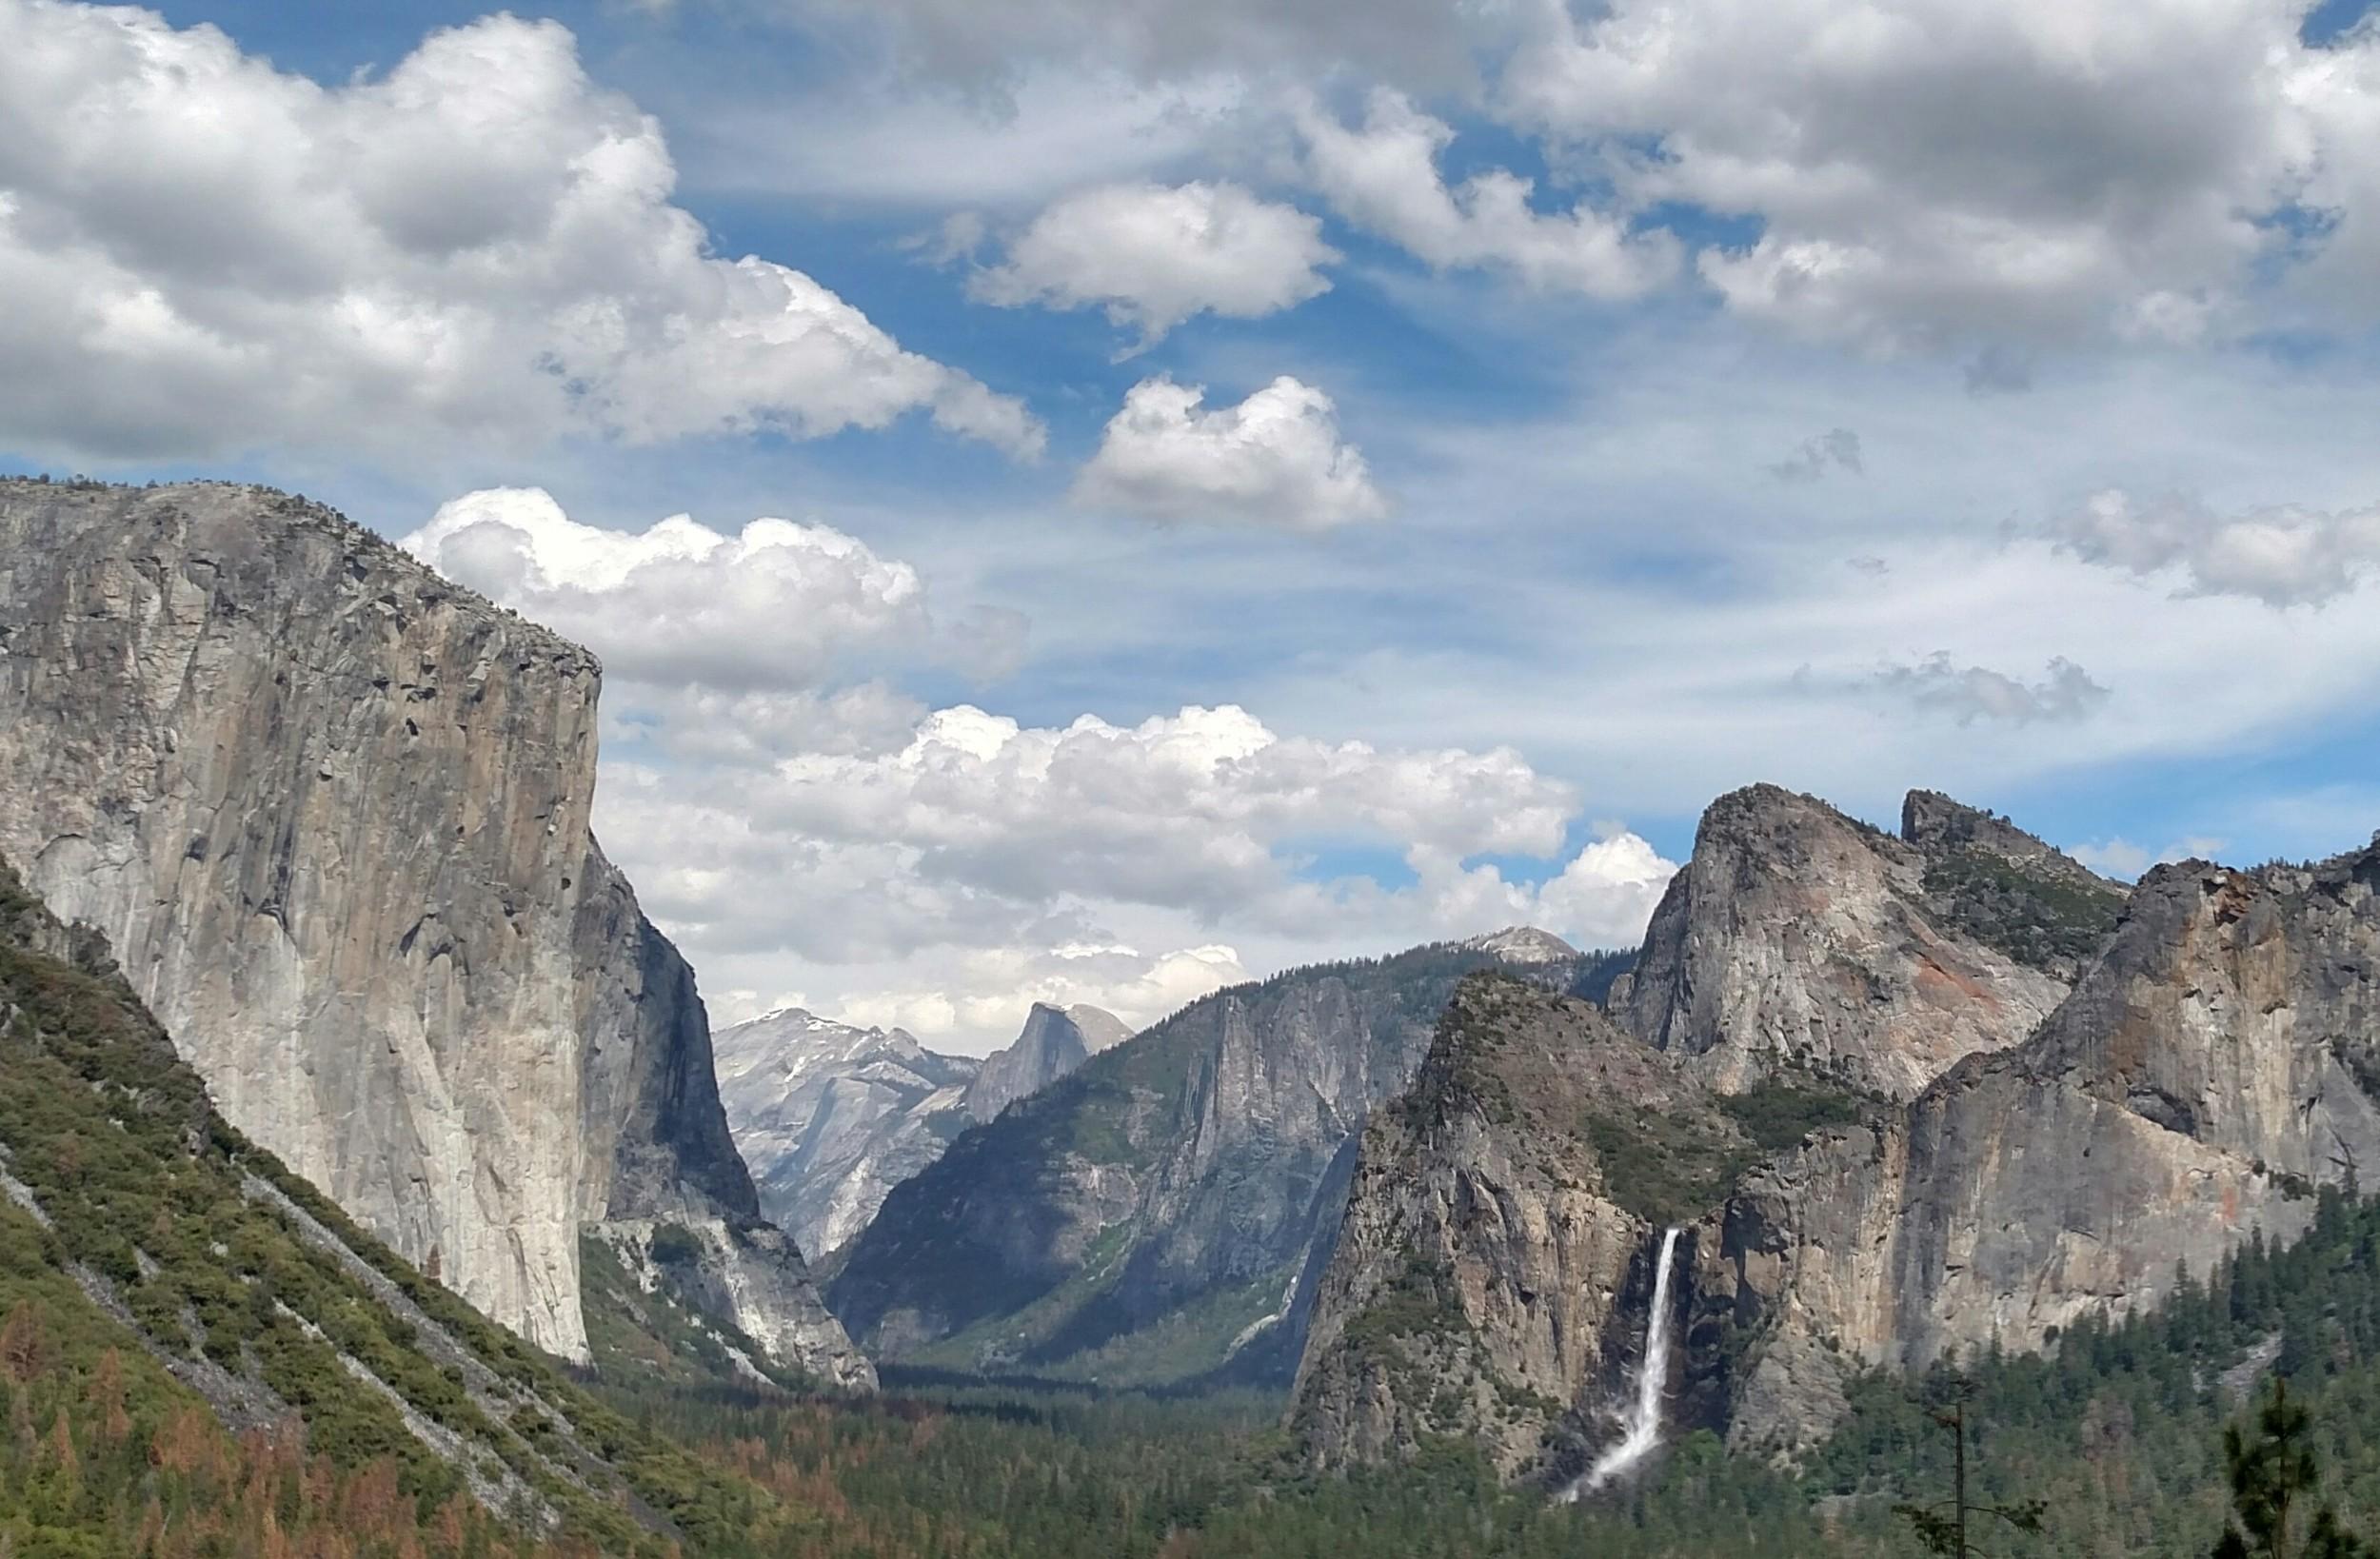 Half Dome in the background. Yosemite. 2016.www.chibeingchi.com